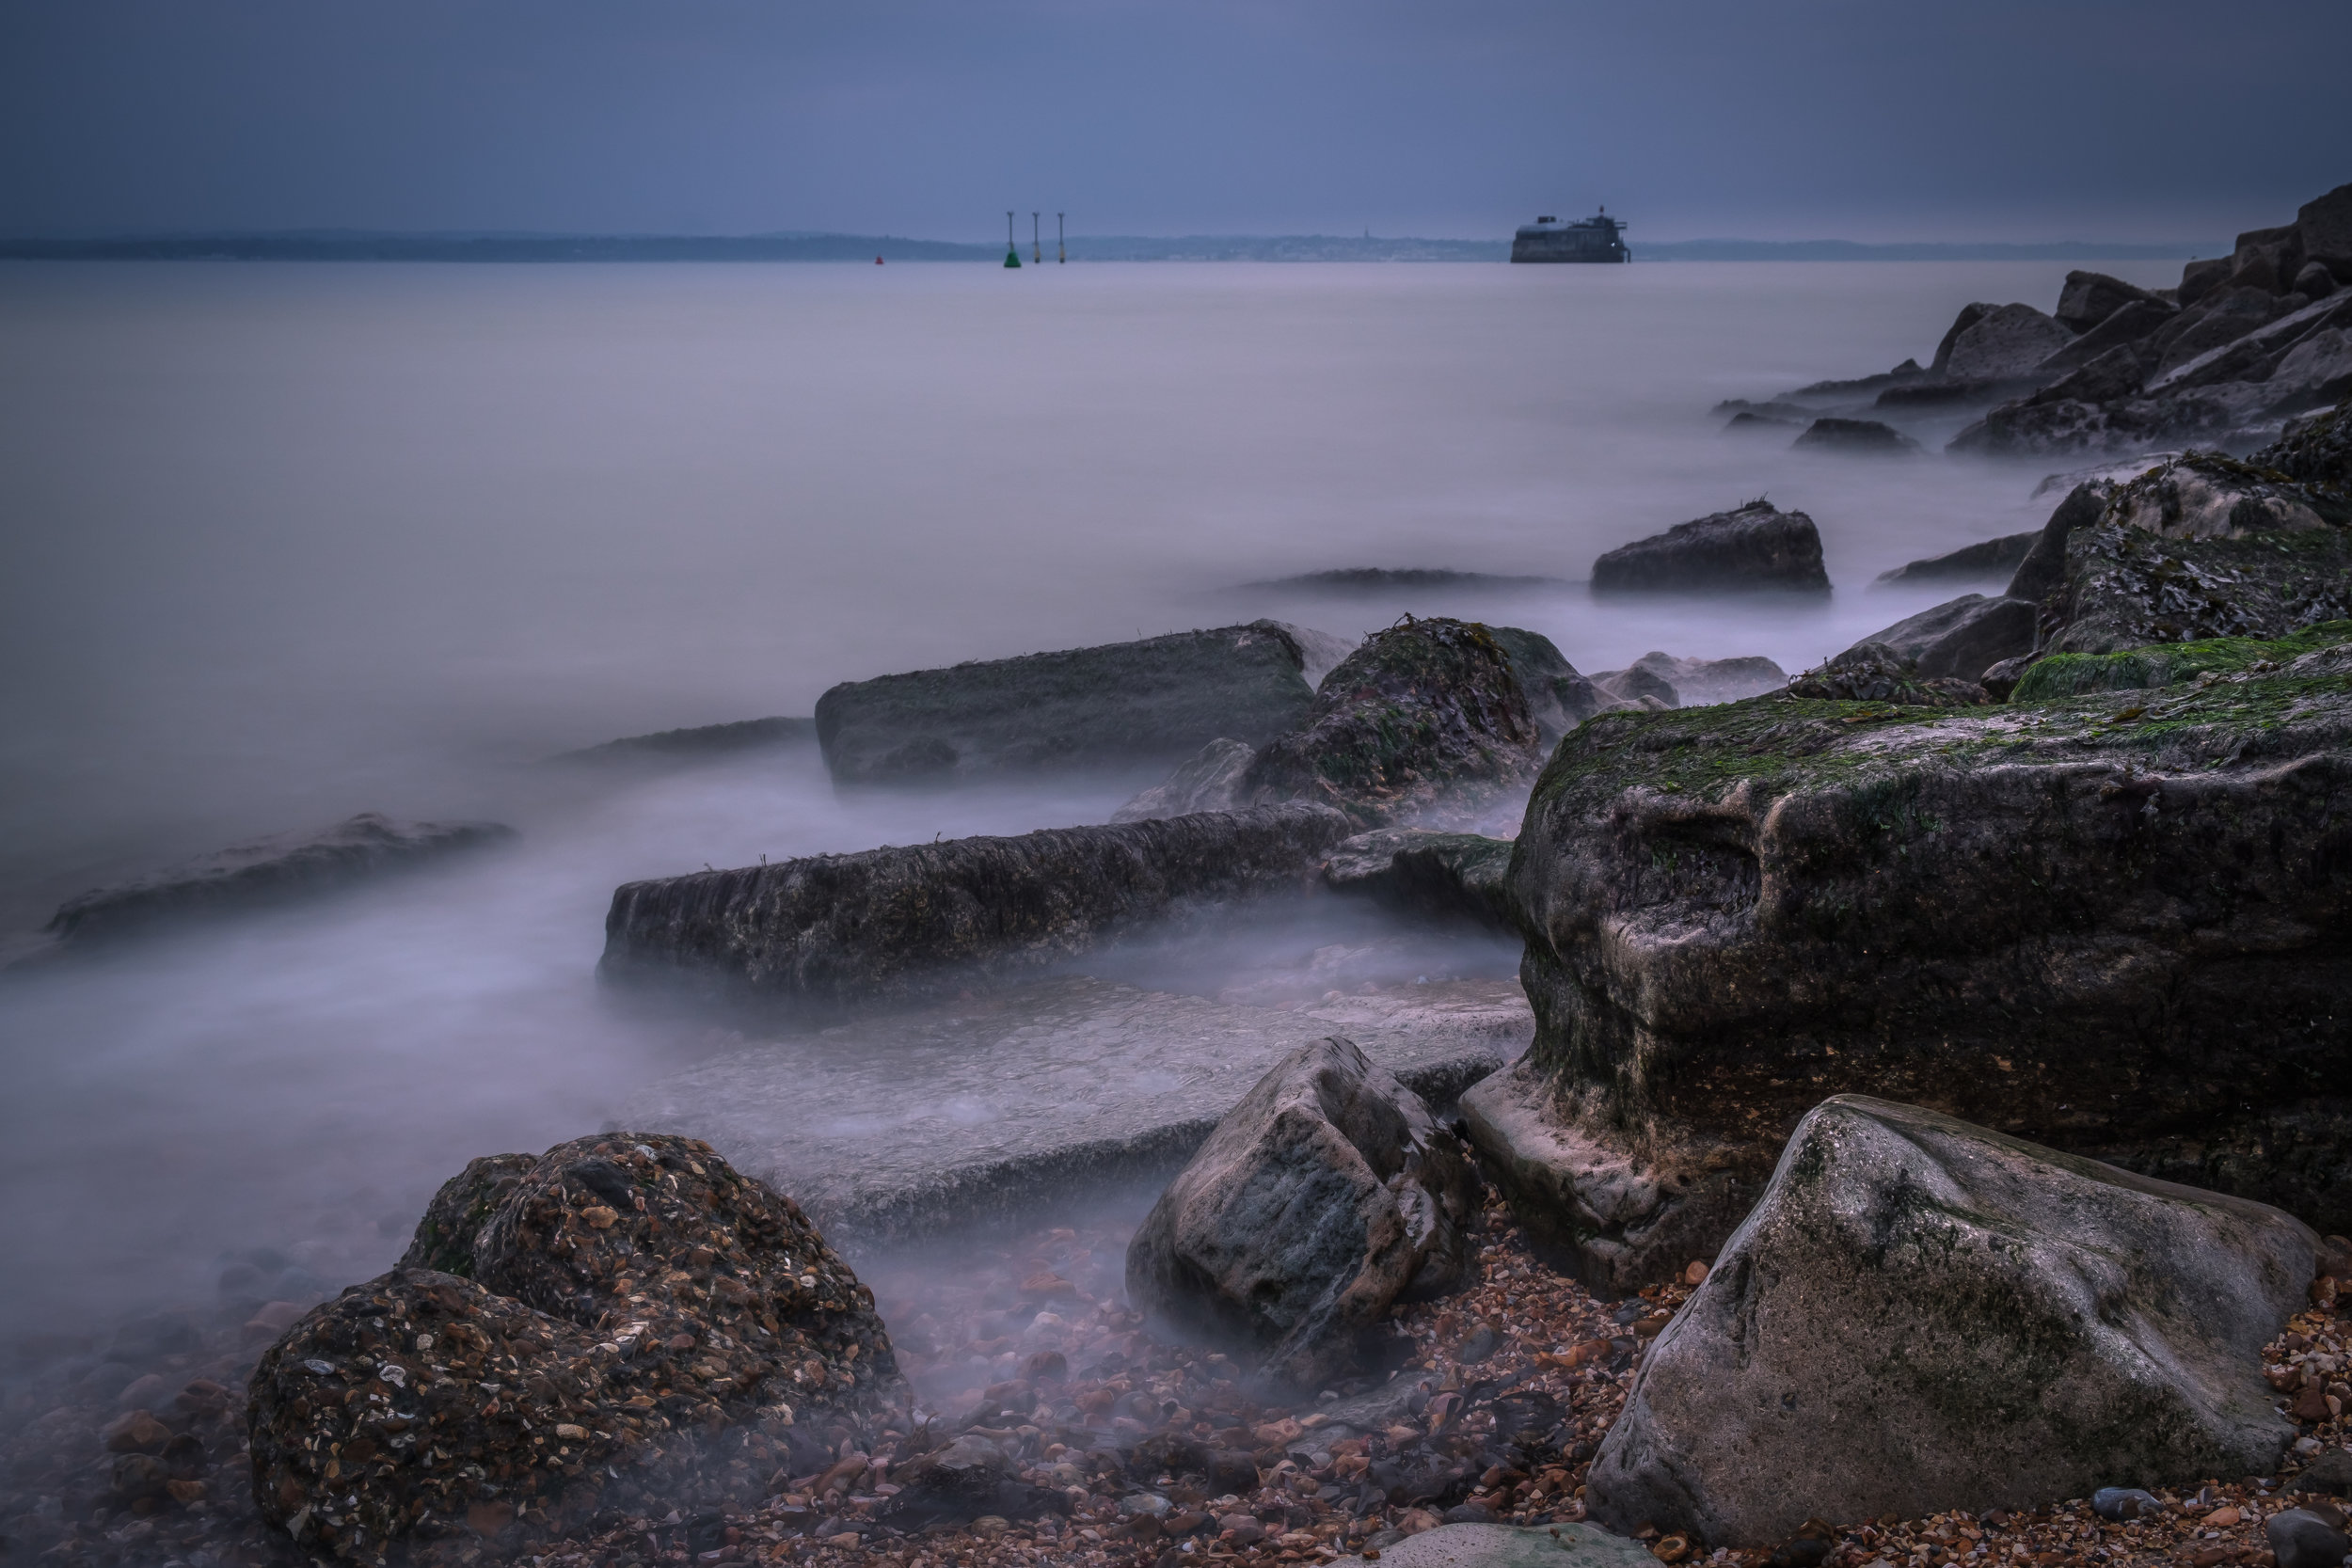 Misty Waters at the Sea Rocks - Southsea, UK